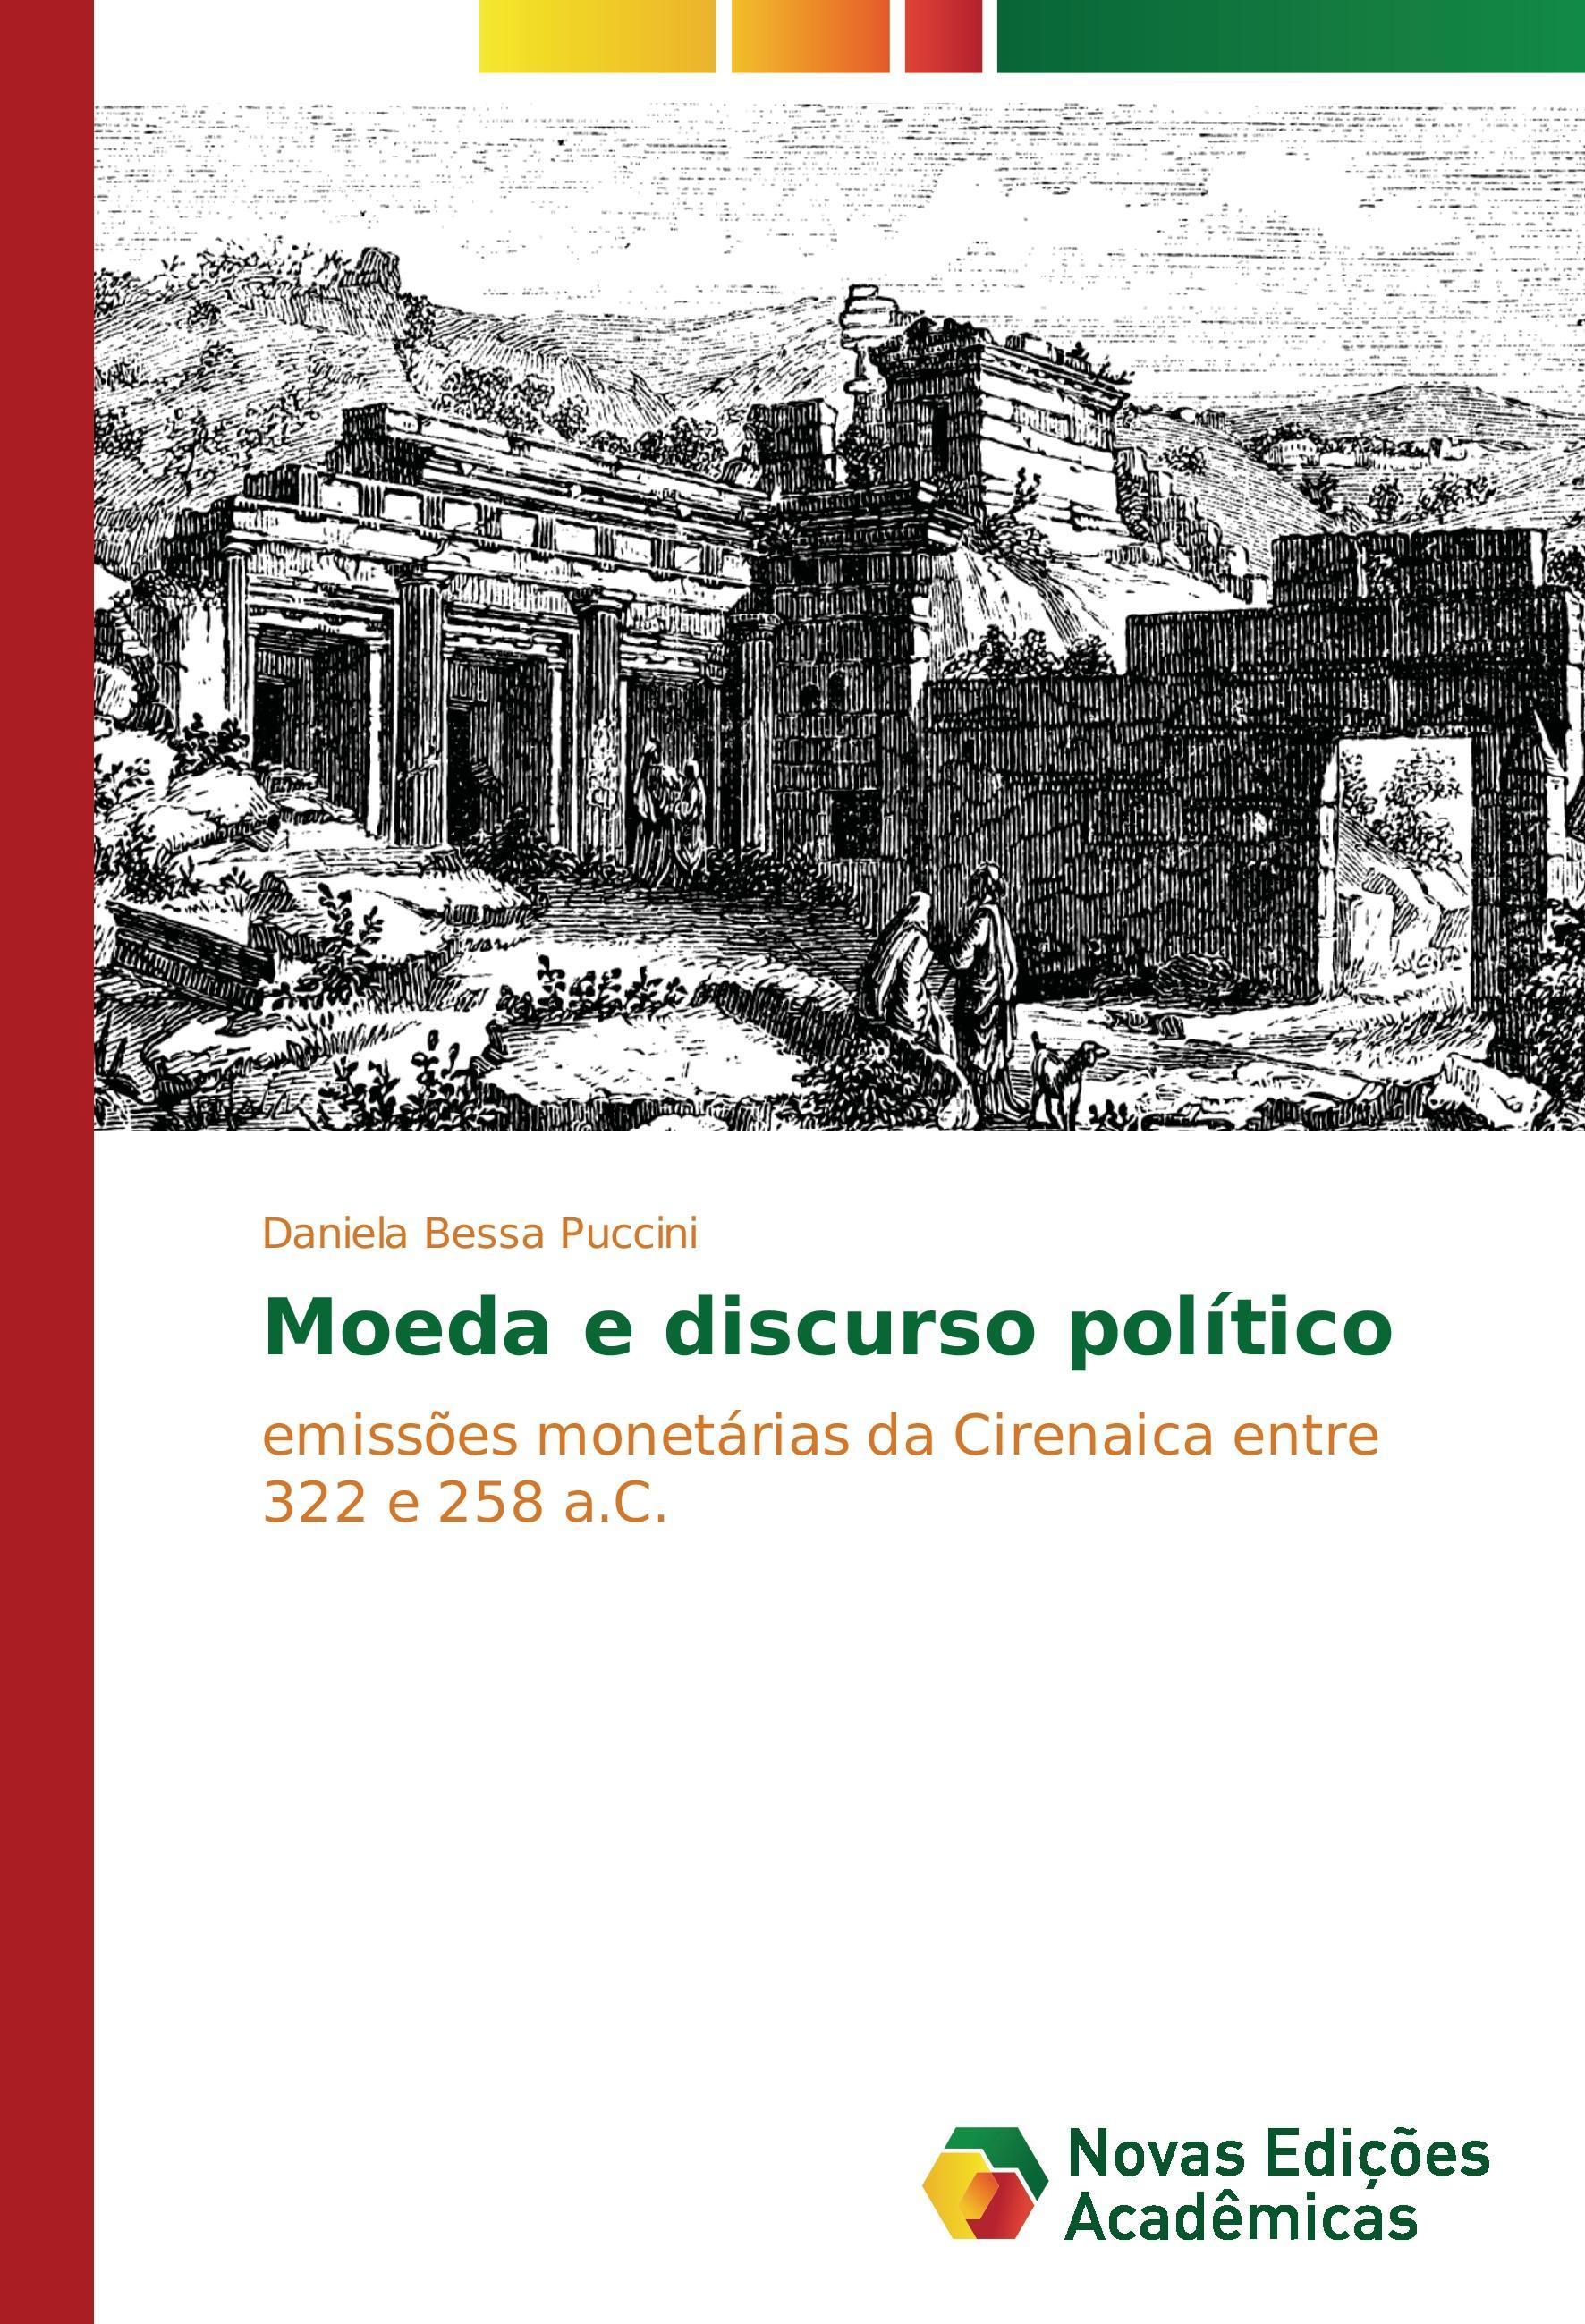 Moeda e discurso político - Bessa Puccini, Daniela